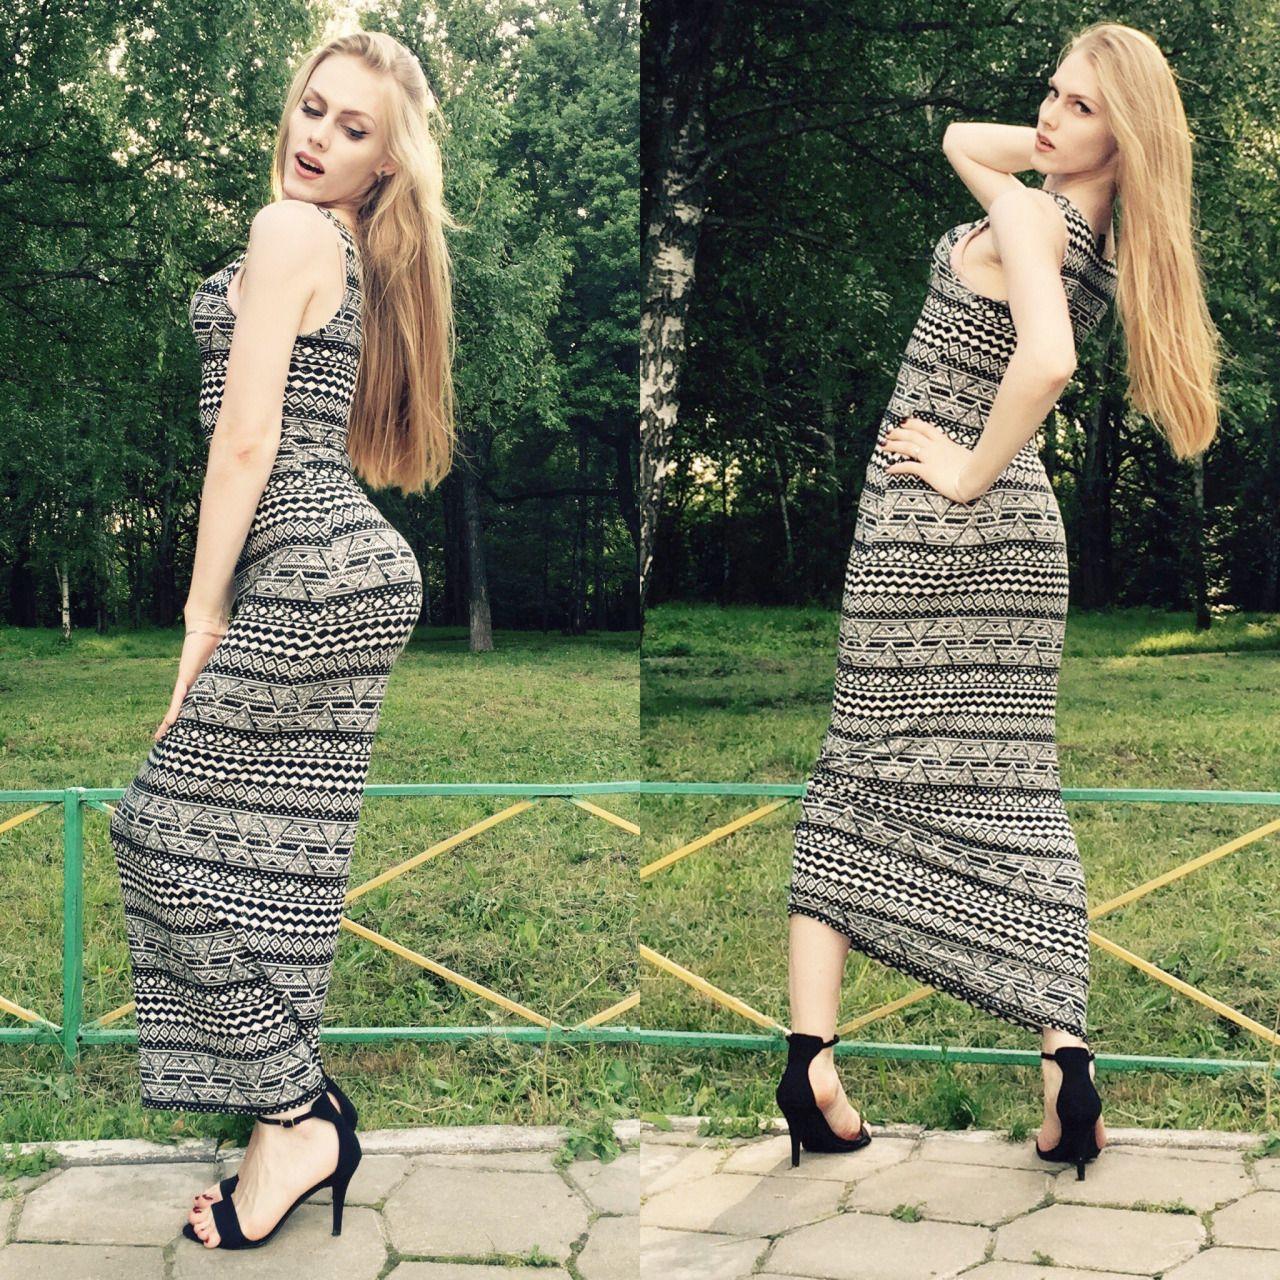 Russian tranny blog